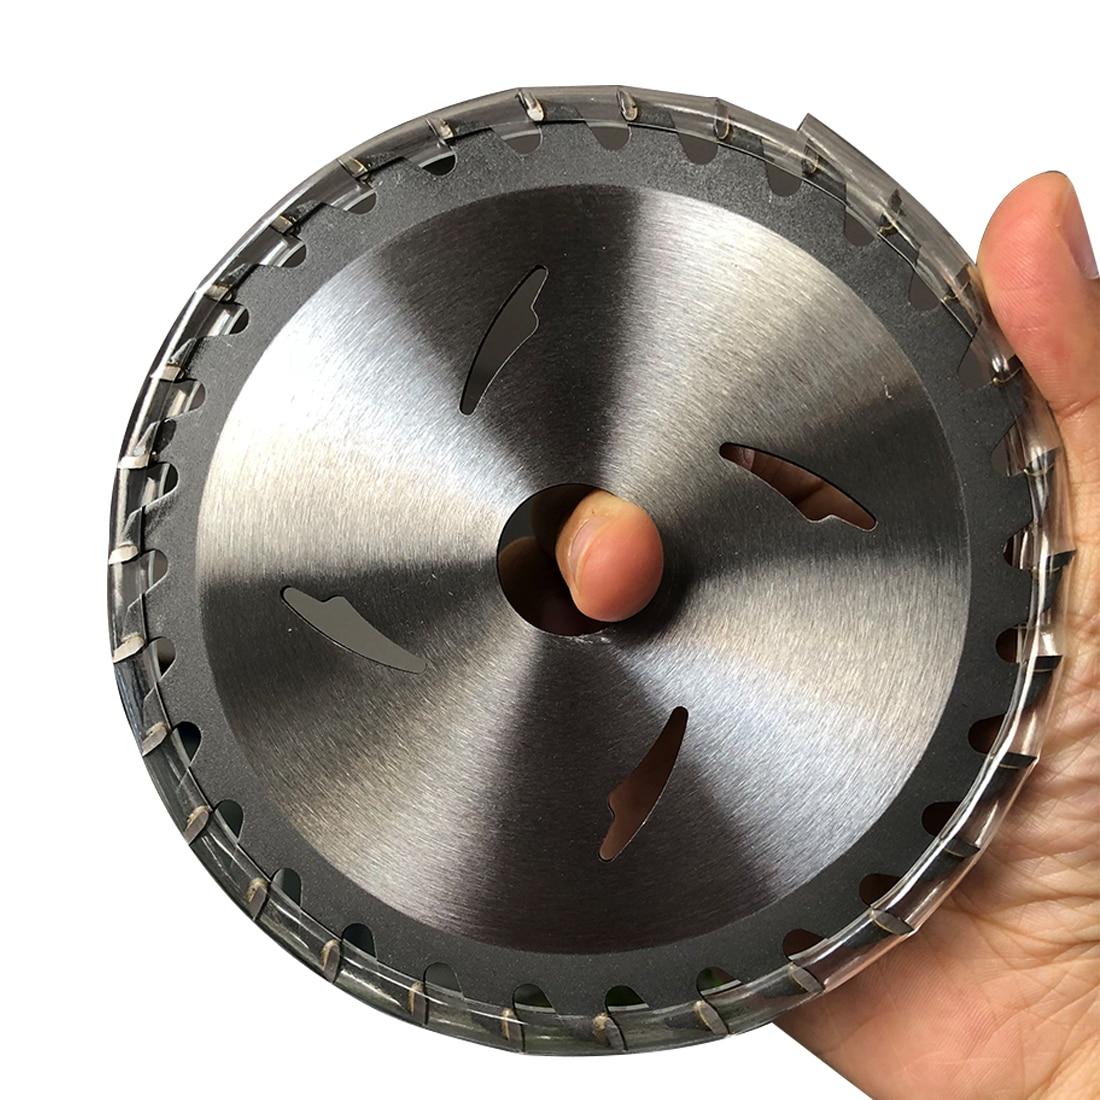 High-grade Woodworking Saw Blade Saw Blade Cutting Piece Wood Cutting Disc 125/110mm*20mm 24T/30T/40T TCT Saw